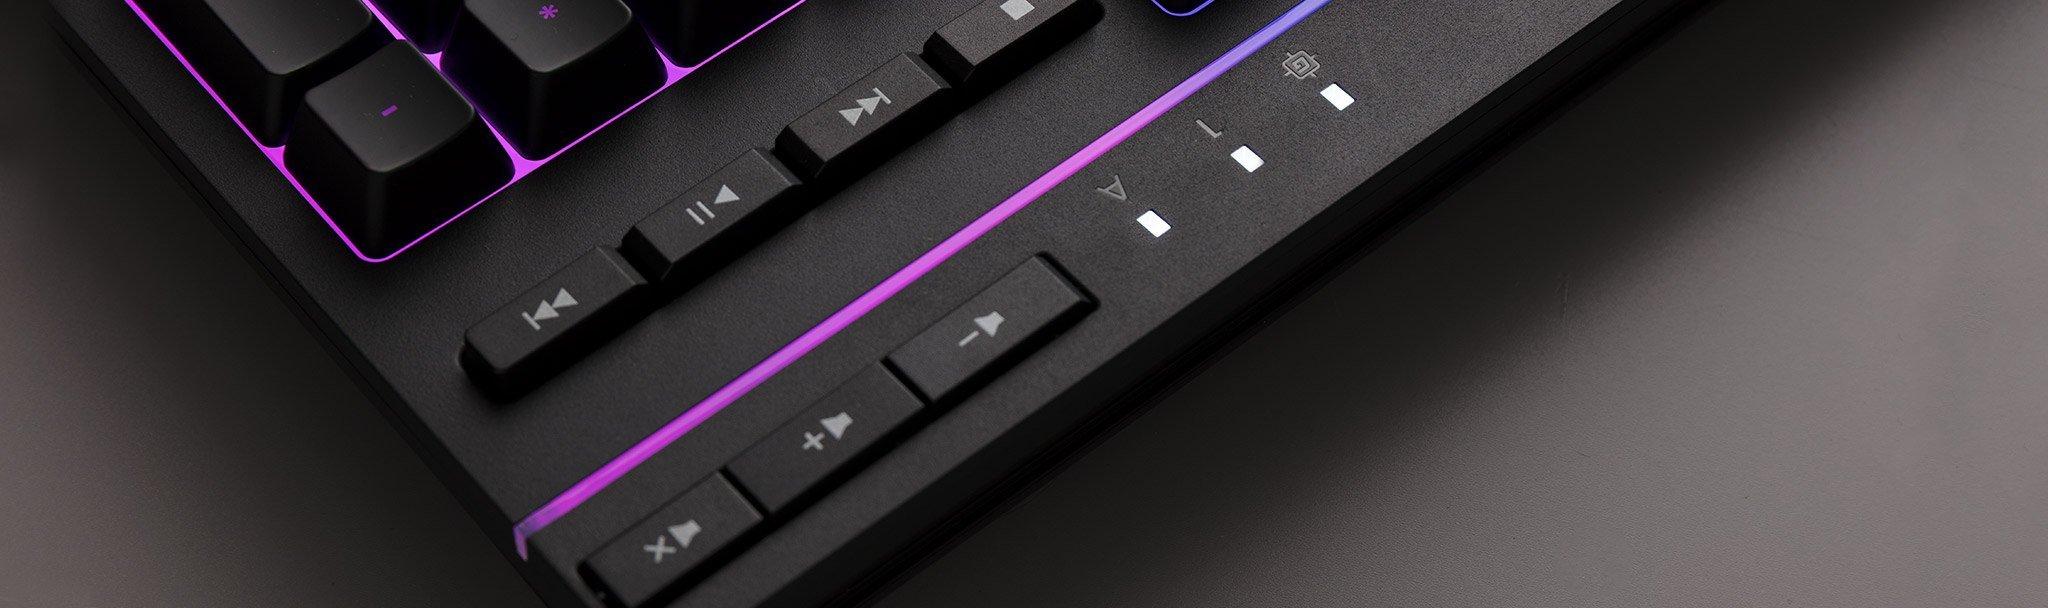 Alloy Core RGB Keyboard